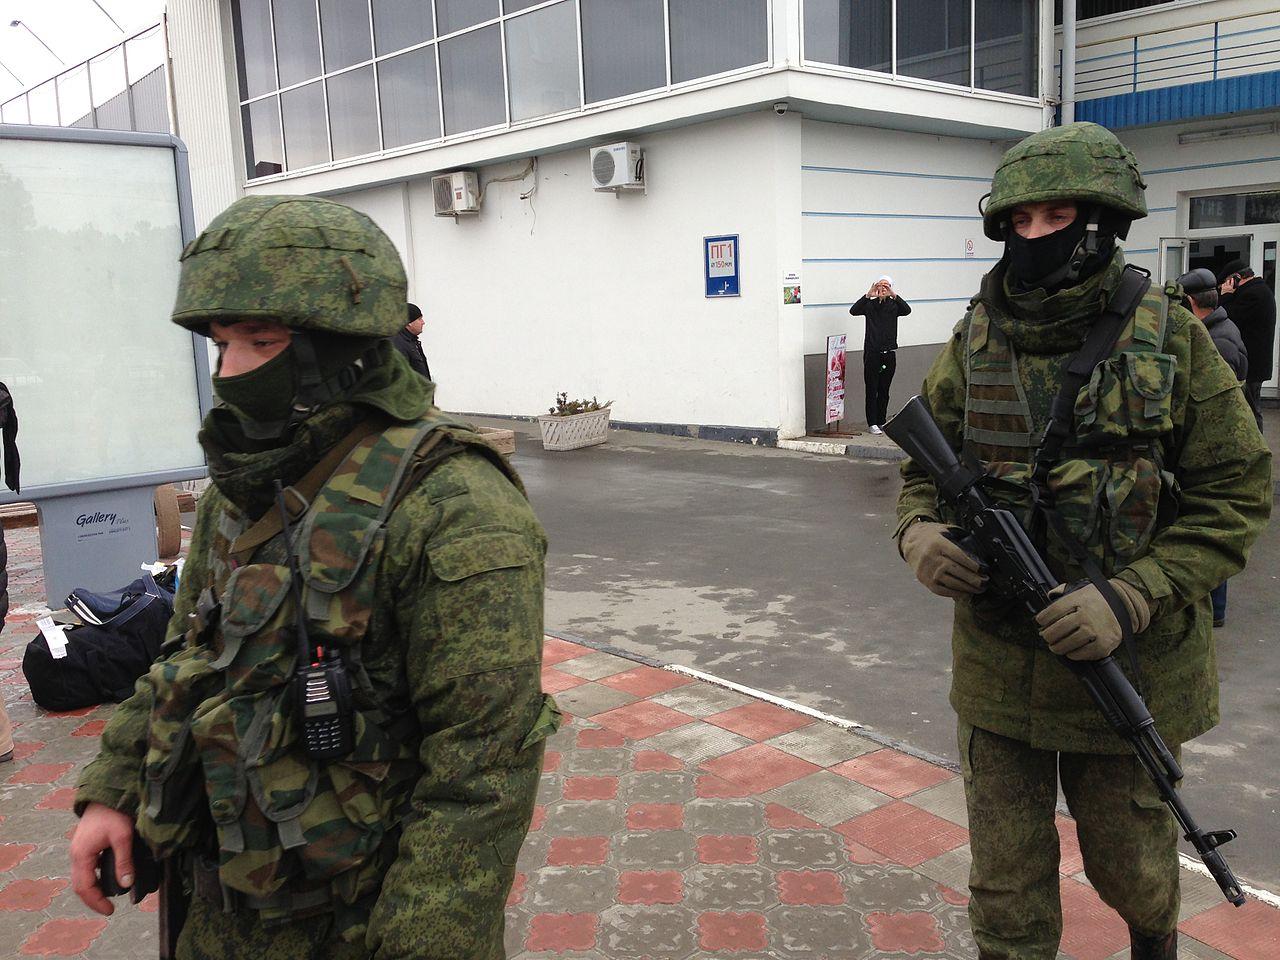 "De ""små grønne menn"". Russiske soldater uten kjennetegn tar kontrollen over Simferopol flyplass på Krim-halvøya 28. februar 2014 (foto: VOA/Wikimedia Commons)"